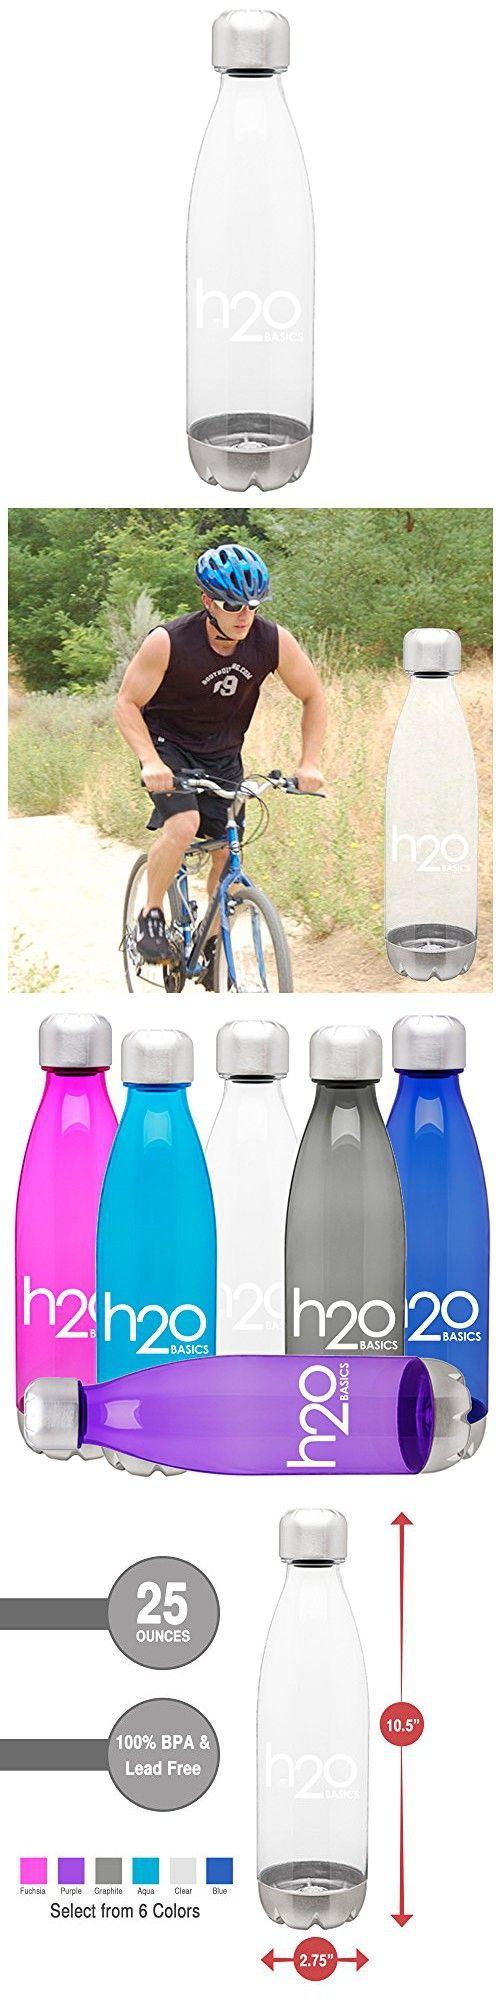 BPAFree Sport Water Bottles 25 oz, Tritan Non Toxic